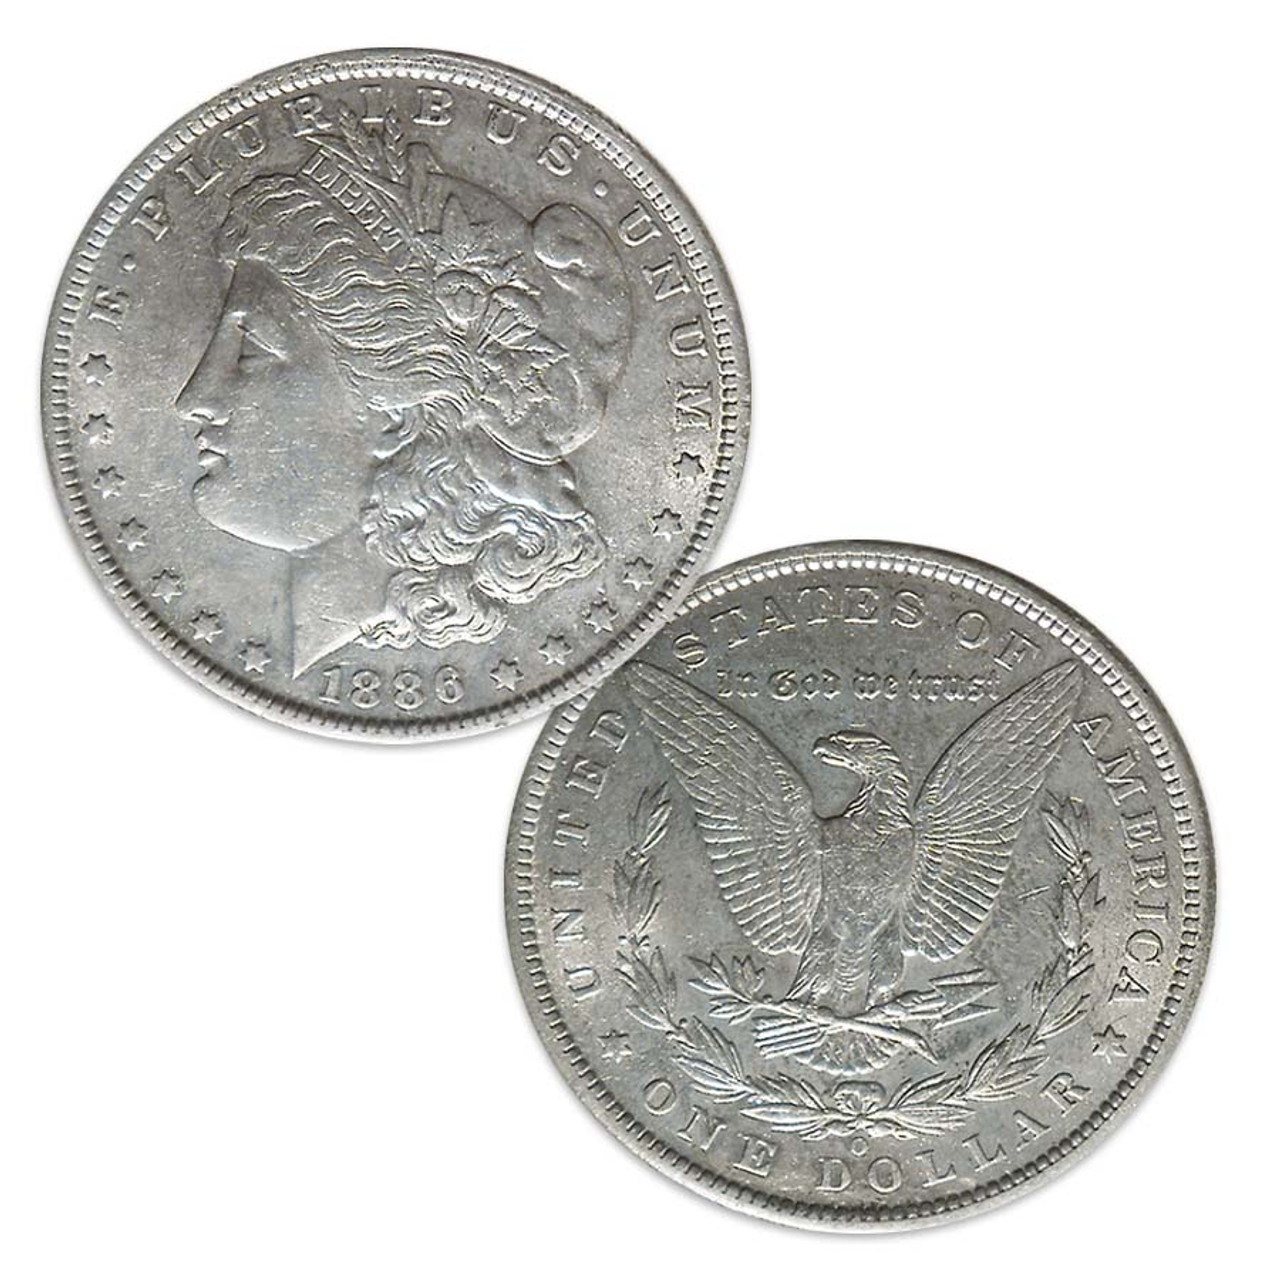 1886-O Morgan Silver Dollar About Uncirculated Image 1